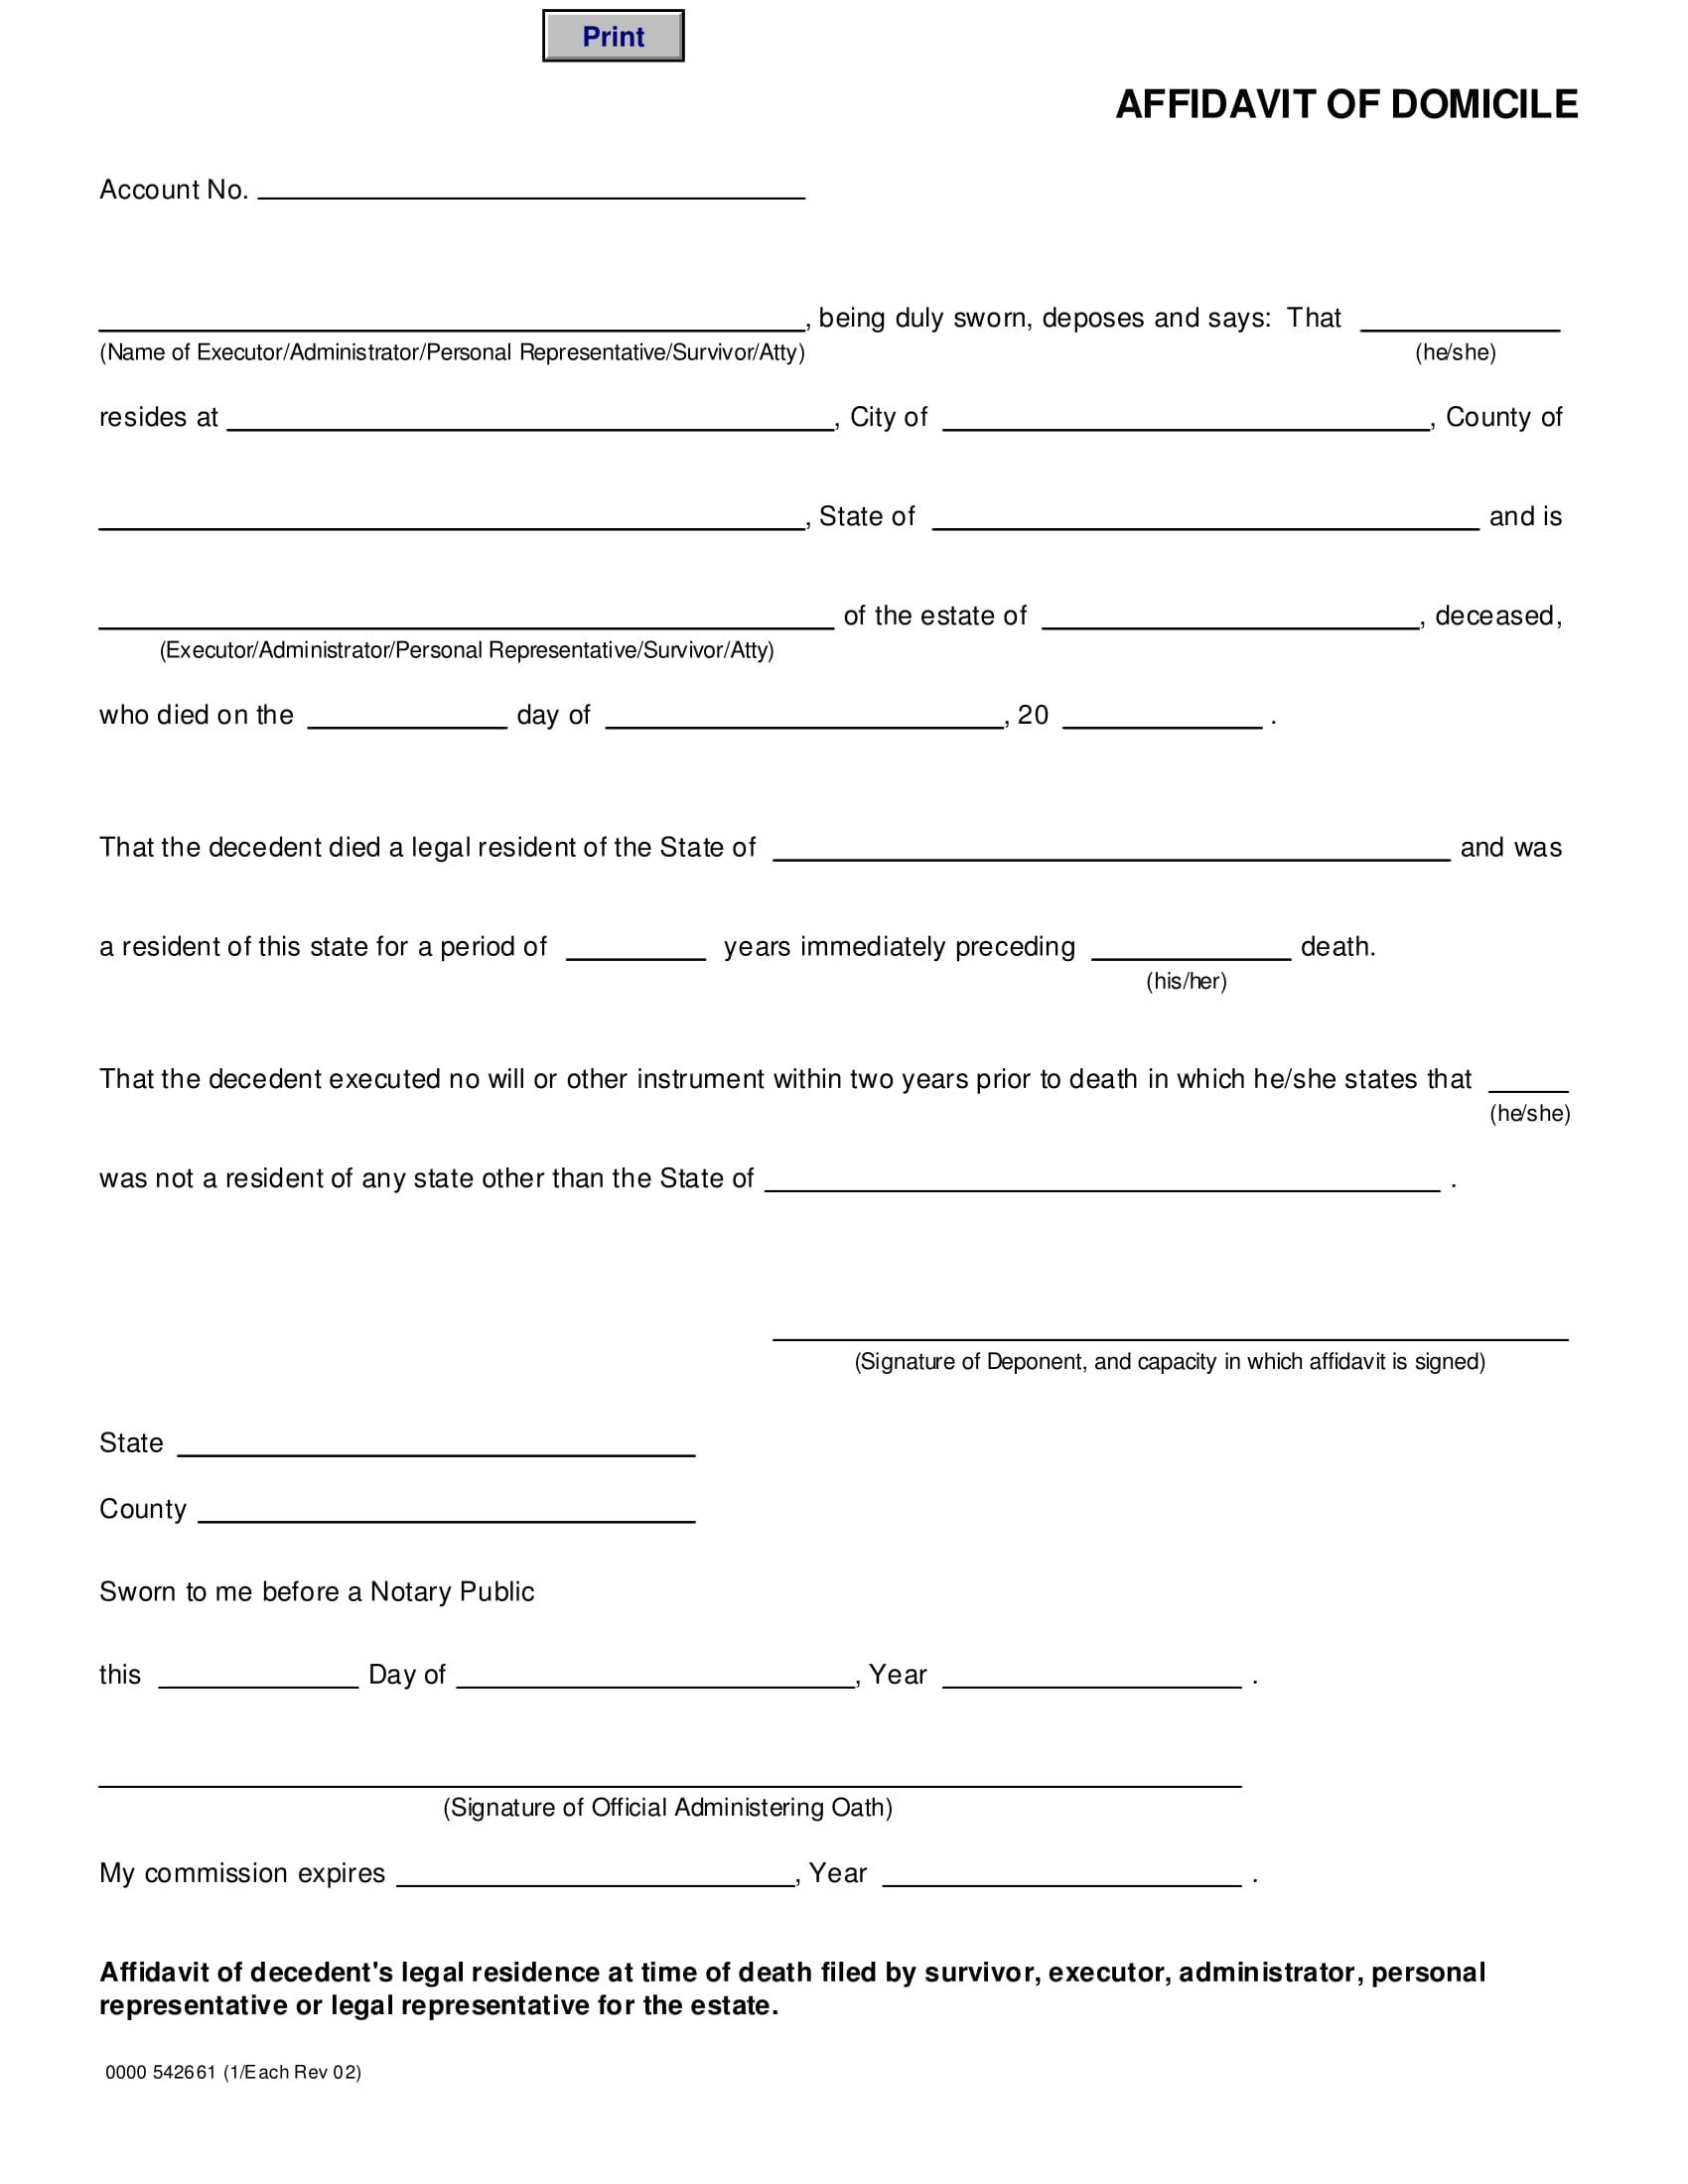 domicile affidavit format 1